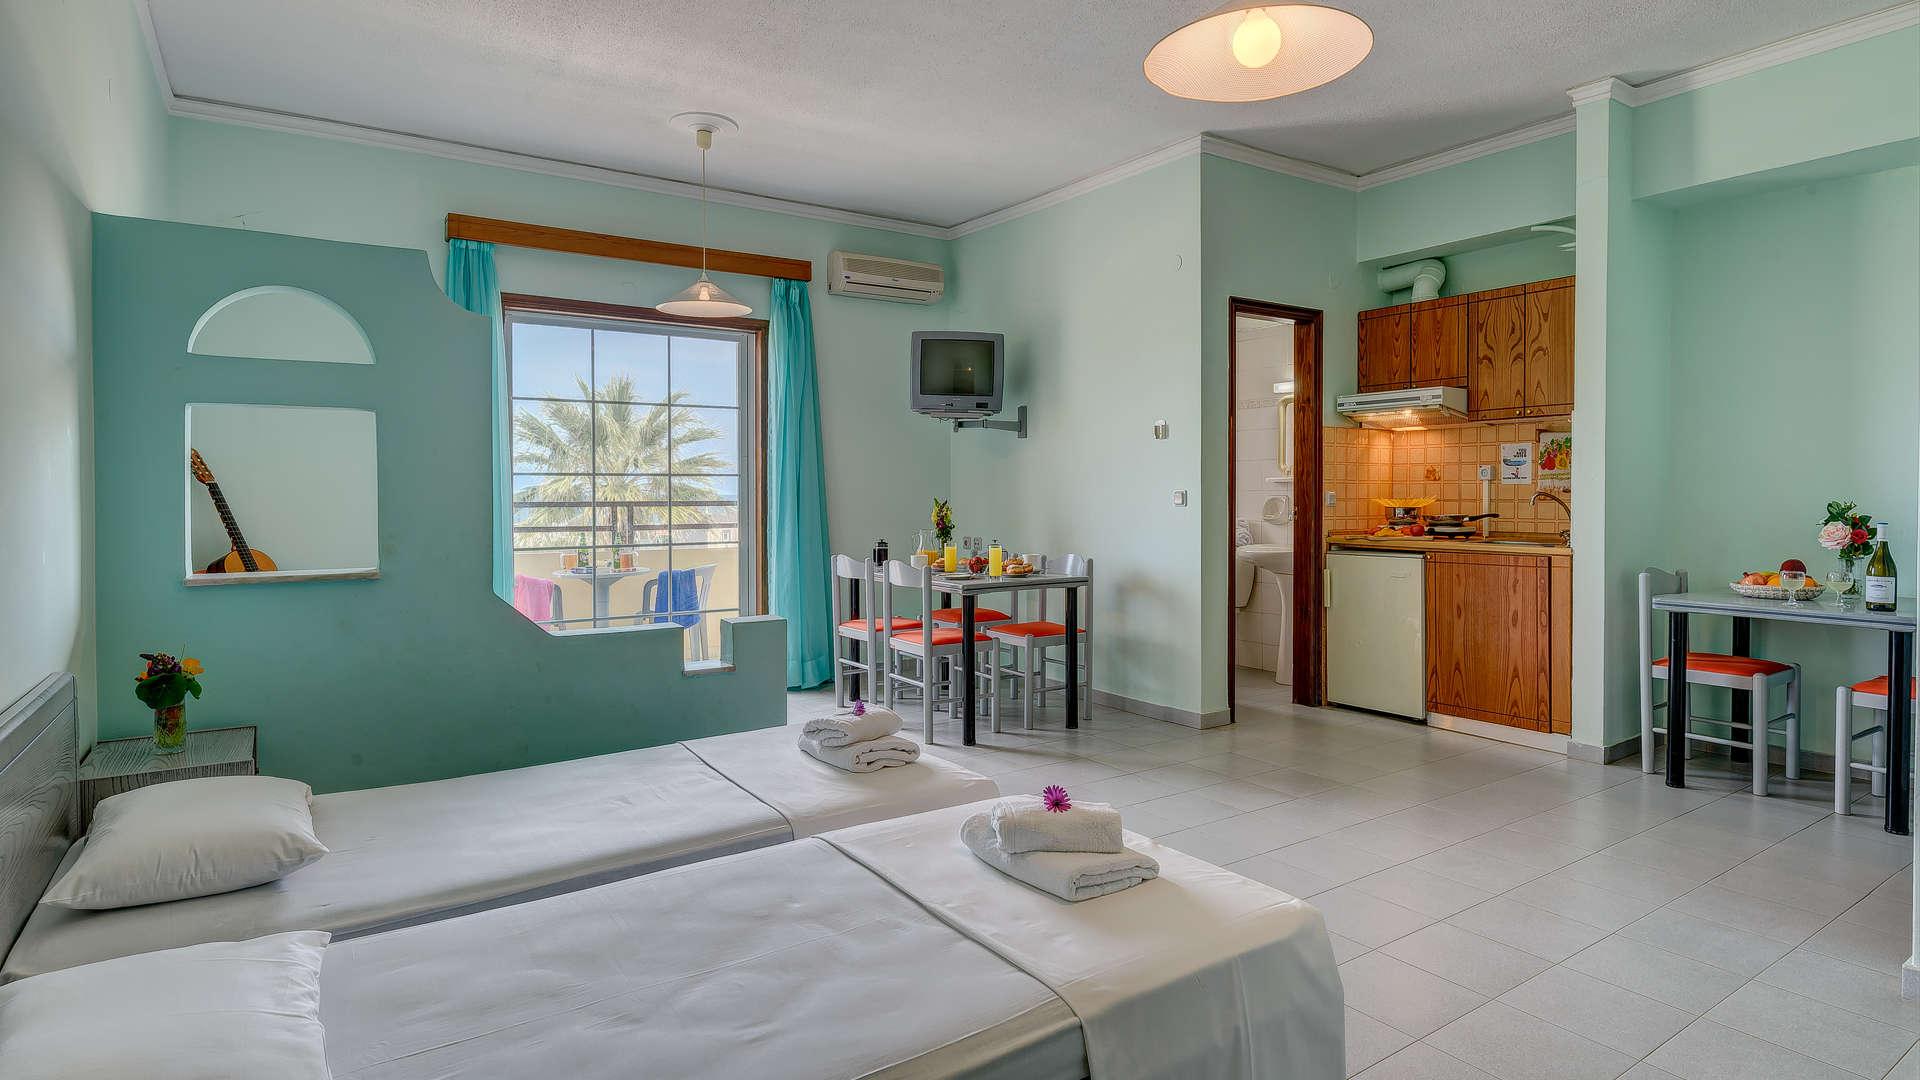 http://louladakis-apts.gr/wp-content/uploads/2017/04/louladakis_apts_large_apartment19.jpg